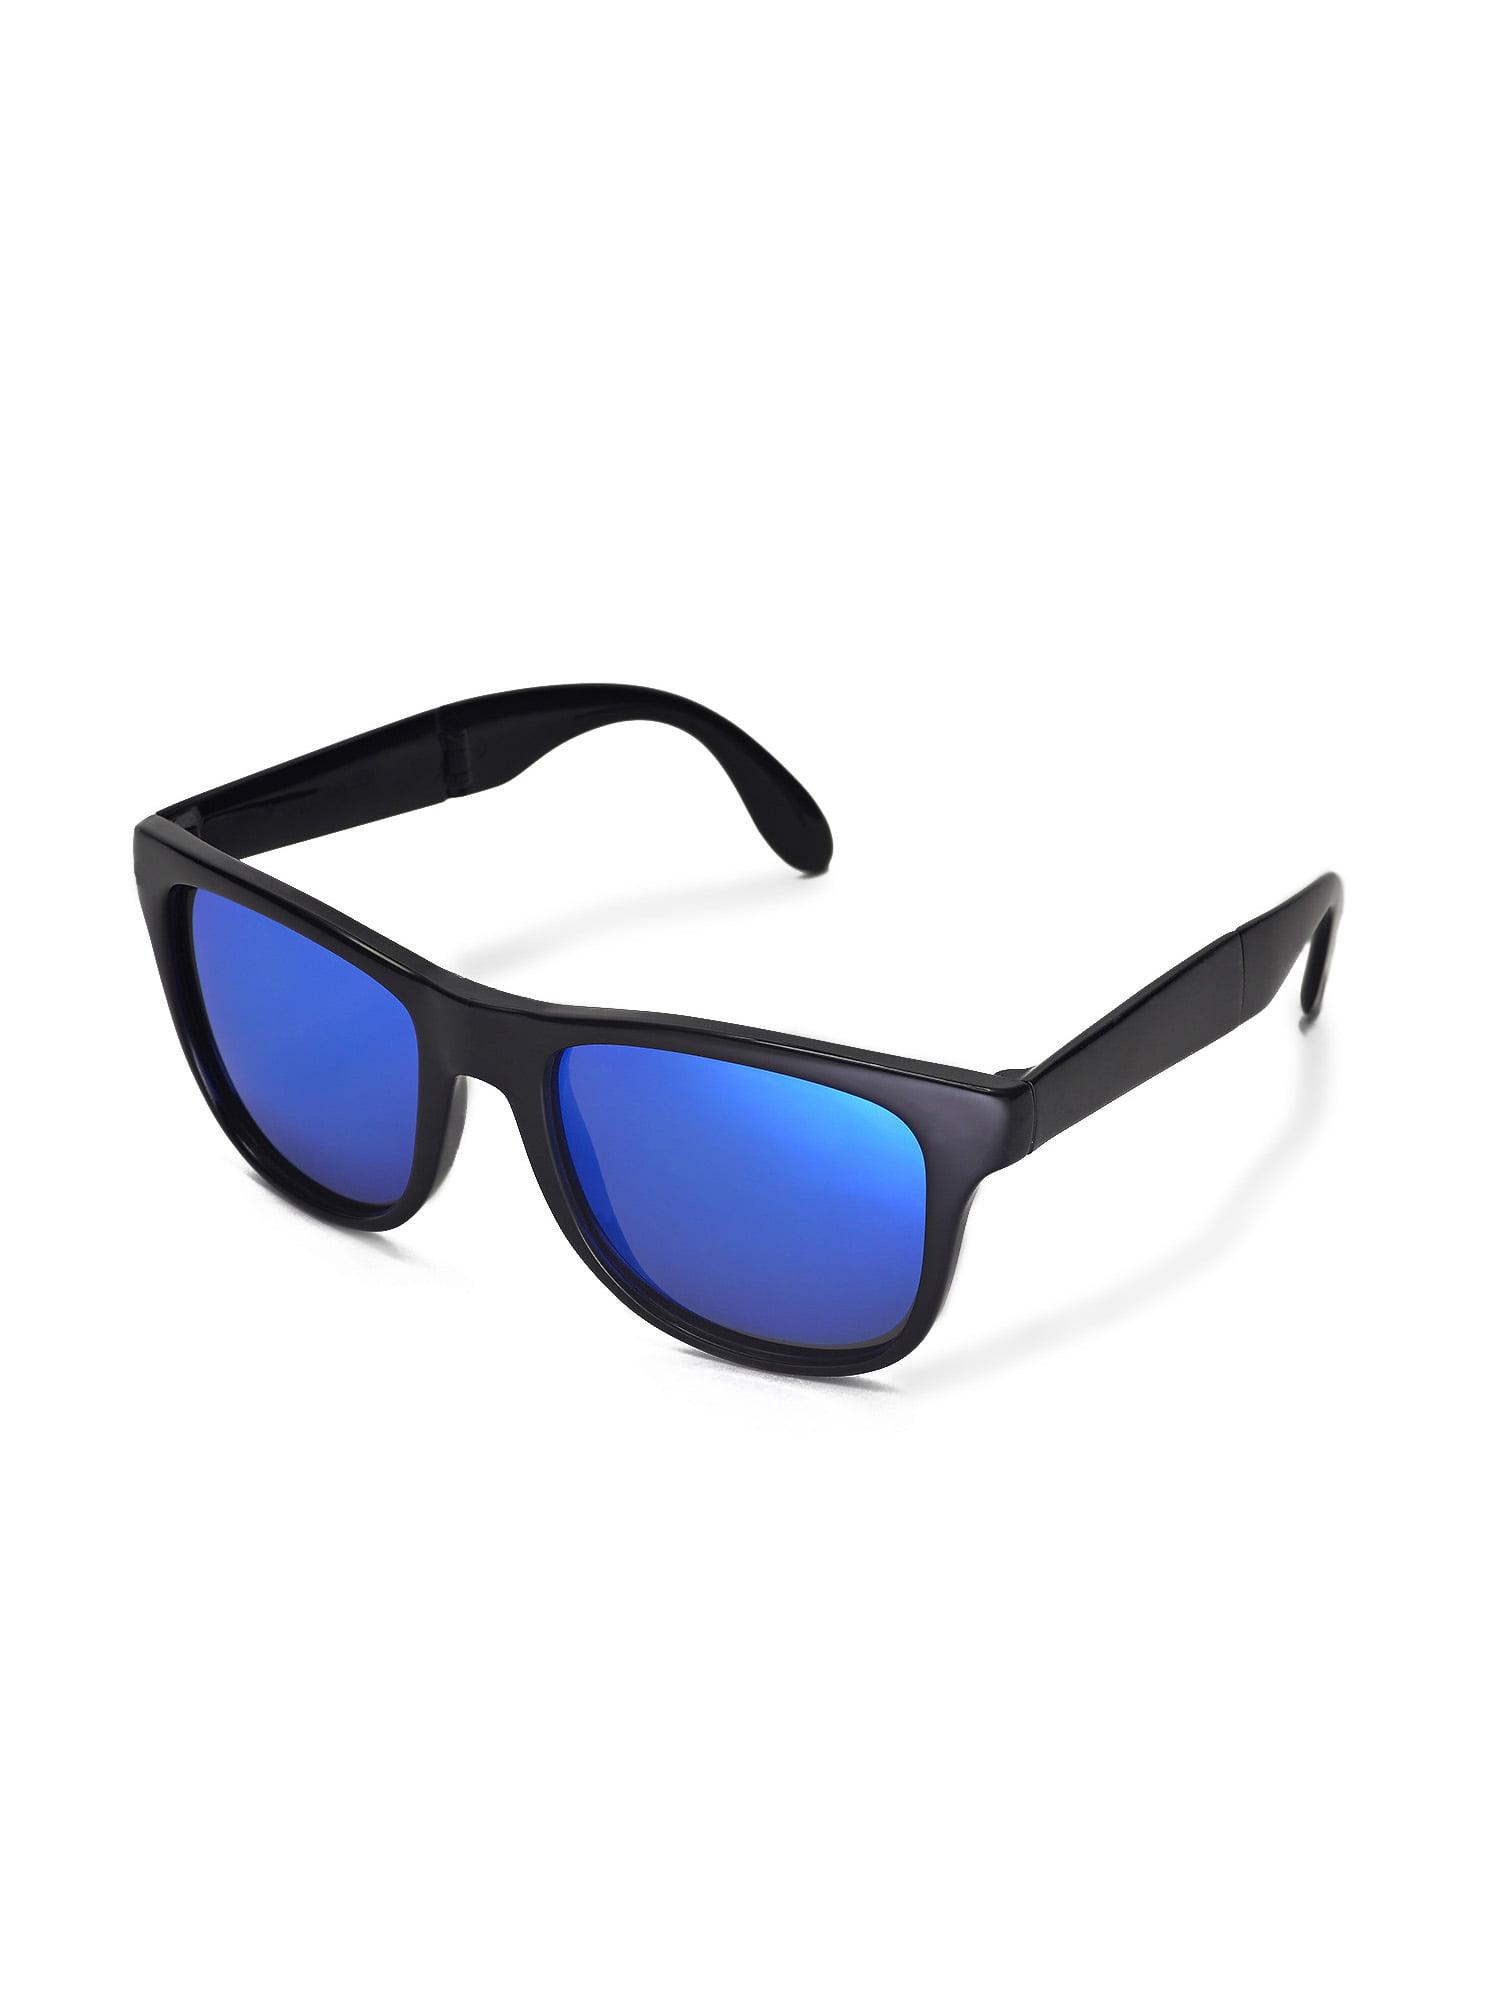 70ded66138 Walleva - Walleva Ice Blue Polarized Replacement Lenses for Ray-Ban  Wayfarer RB4105 54mm Sunglasses - Walmart.com